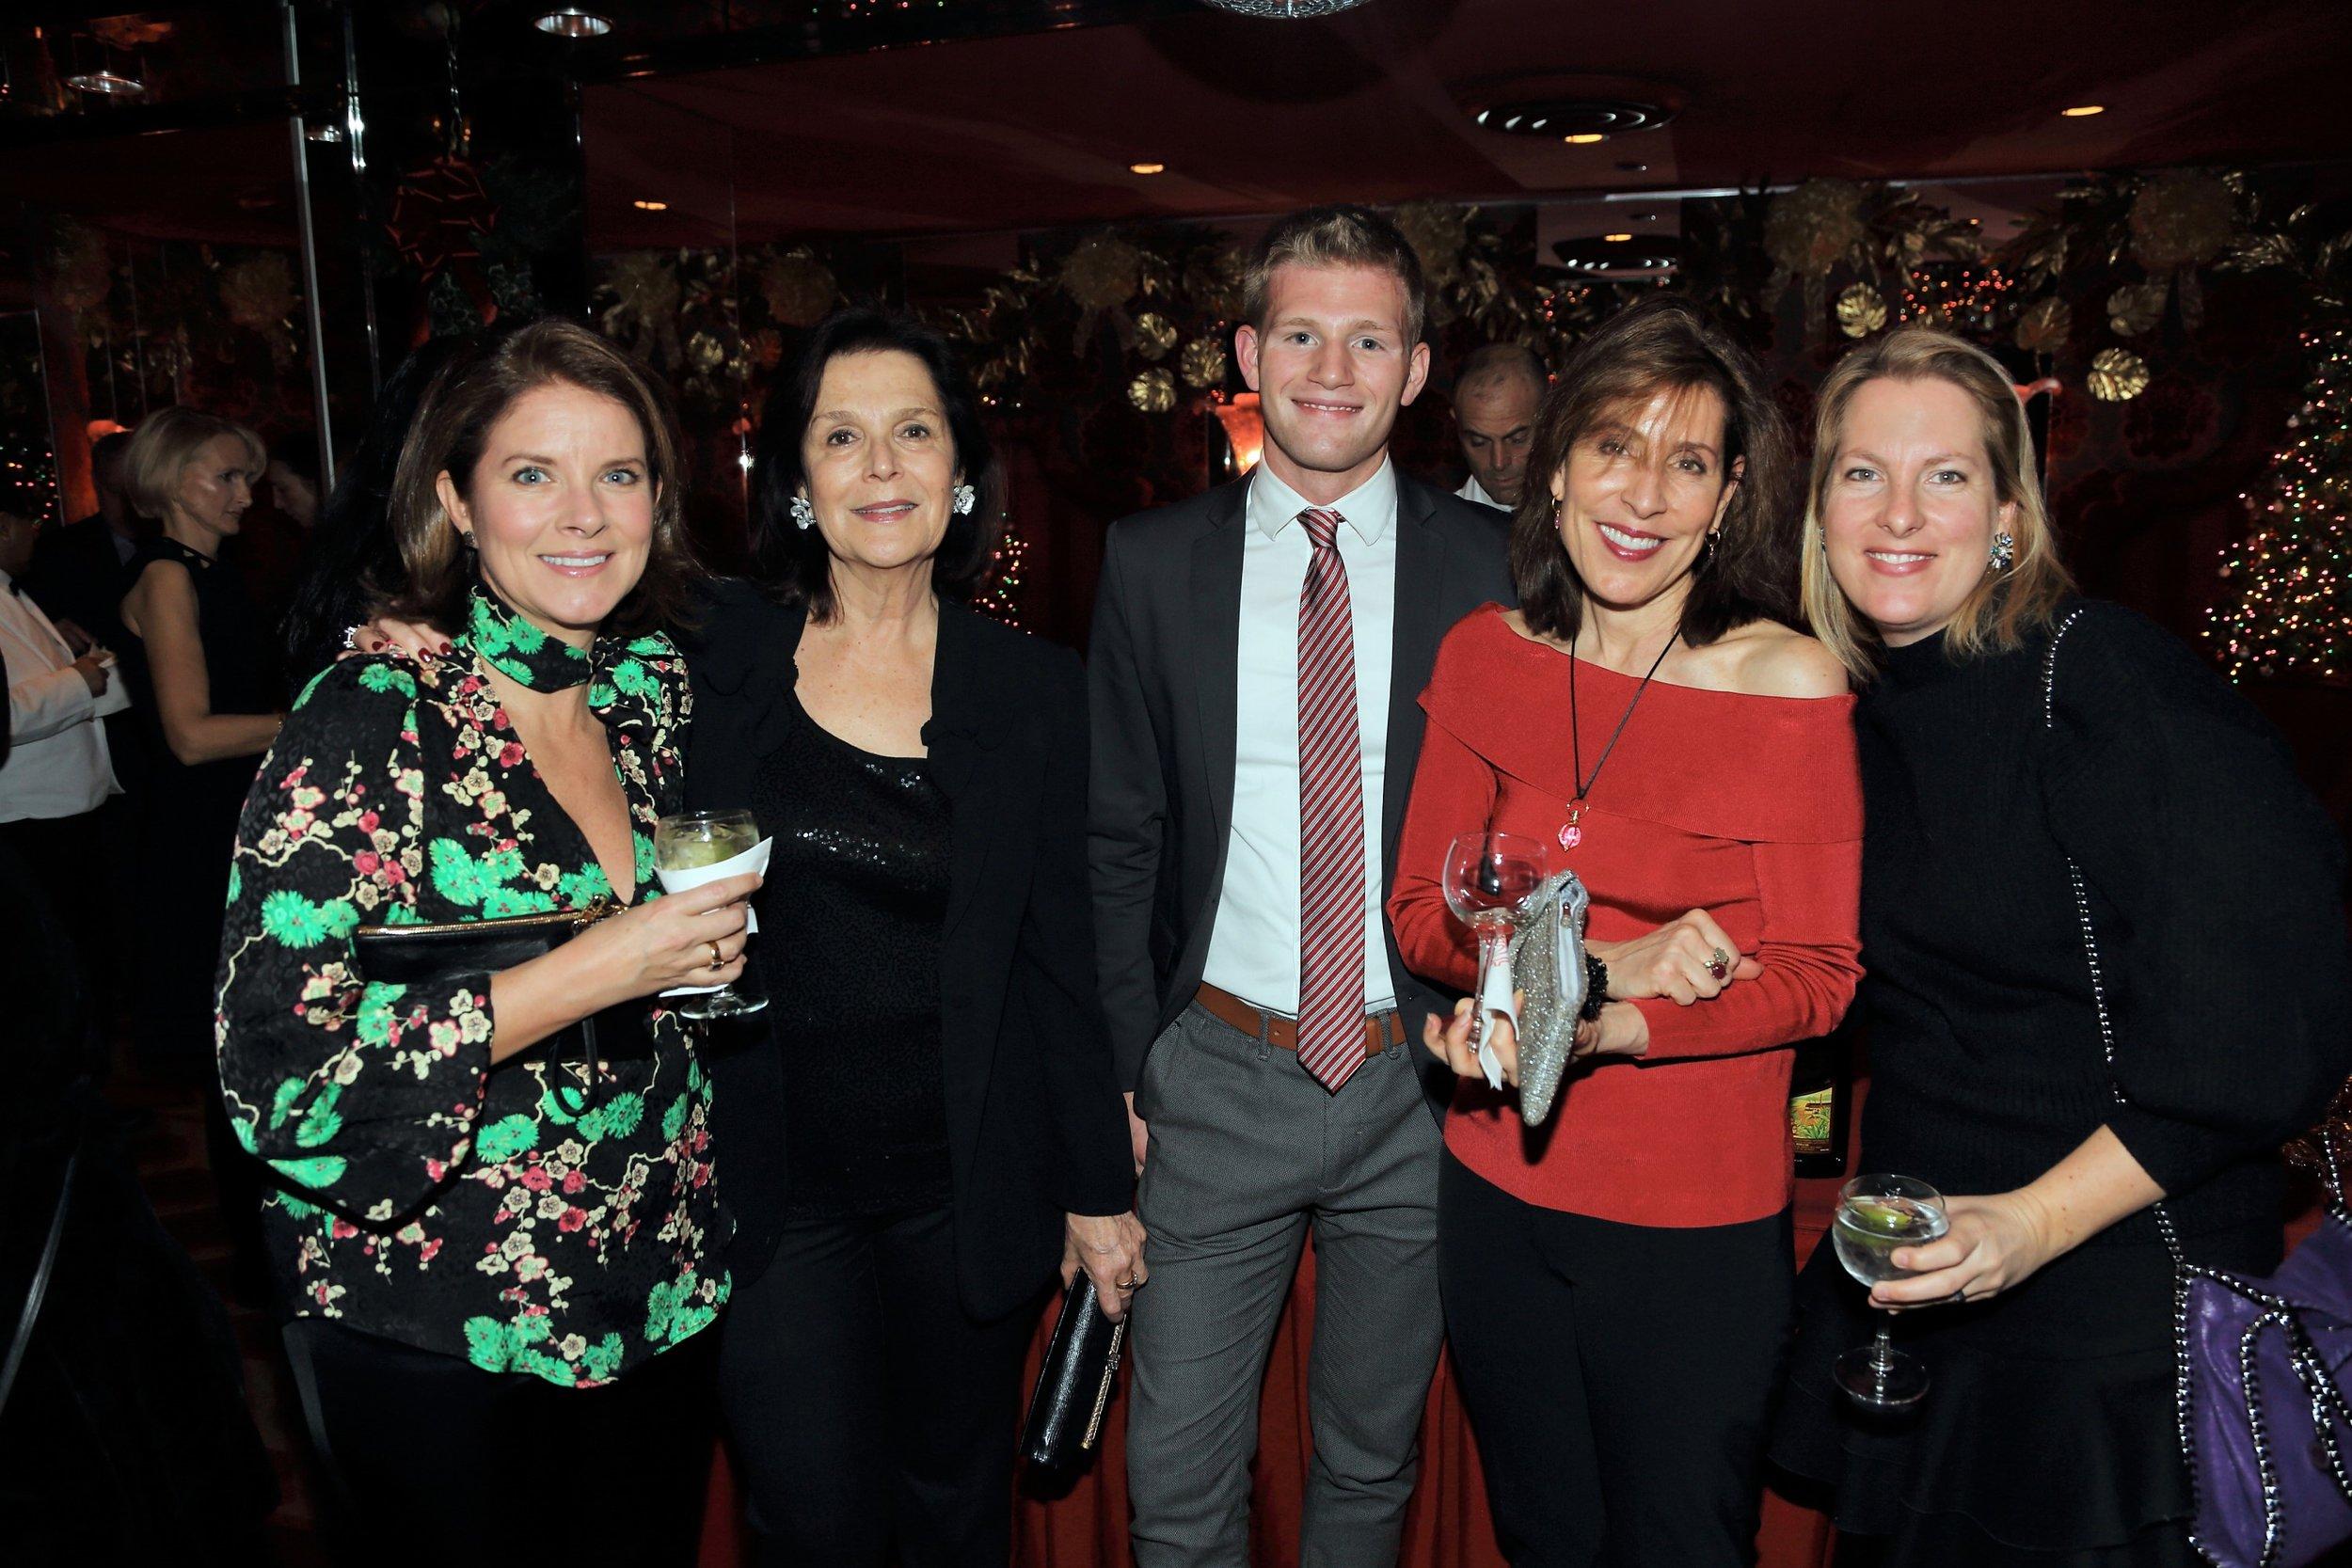 (L to R) Shelton Smith, Barbara Evans-Butler, Josh D'Ambrosio, Pamela D'Arc, Cornelia Van Amberg